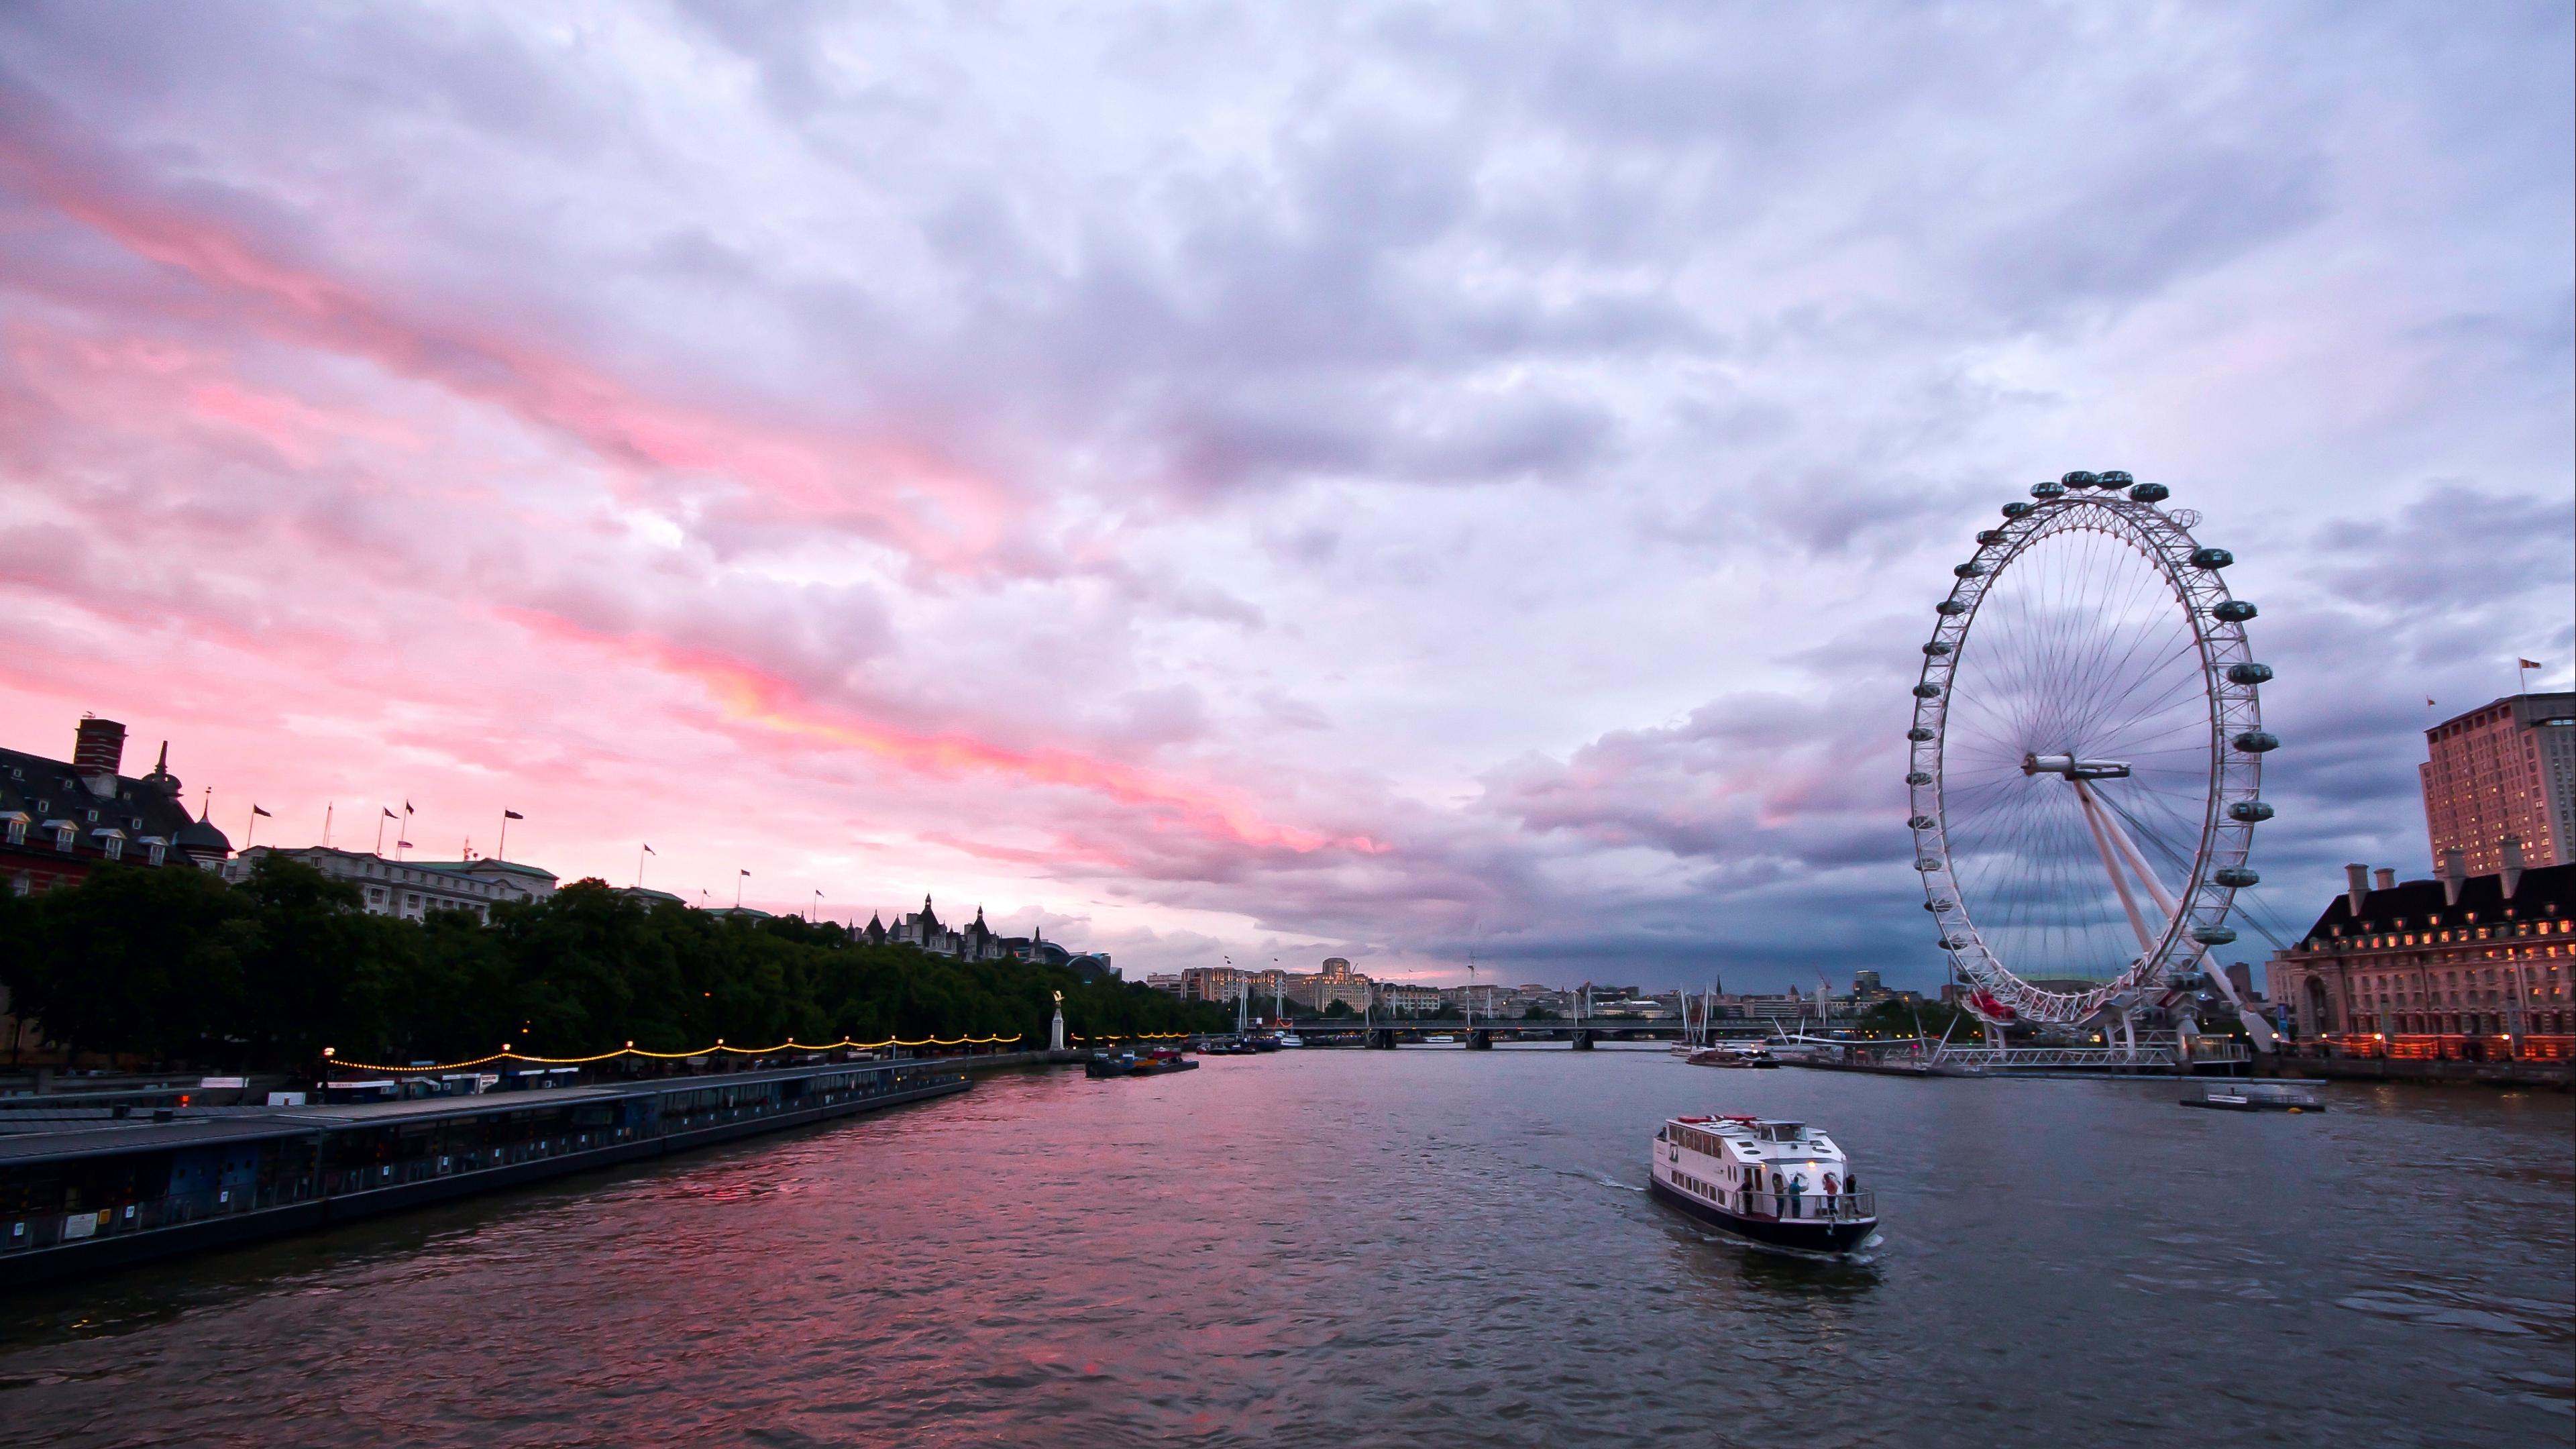 uk england london capital ferris wheel night building architecture promenade river thames sky clouds 4k 1538065647 - uk, england, london, capital, ferris wheel, night, building, architecture, promenade, river, thames, sky, clouds 4k - uk, London, England